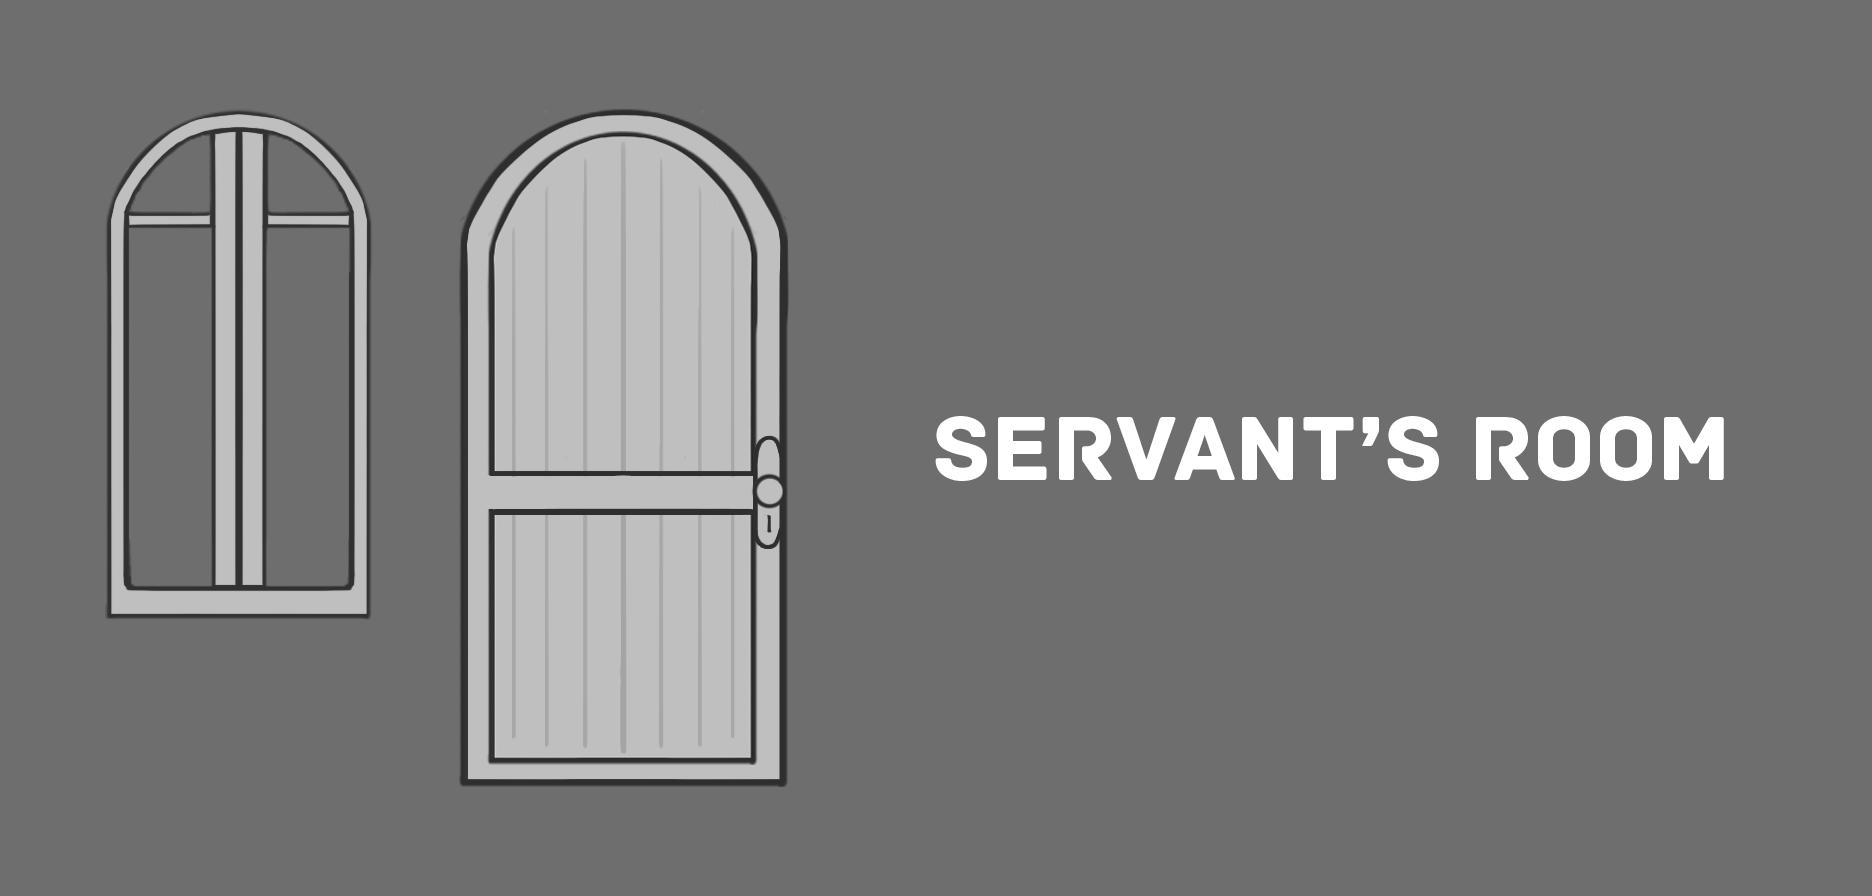 6a ED23 Servants Room Door and